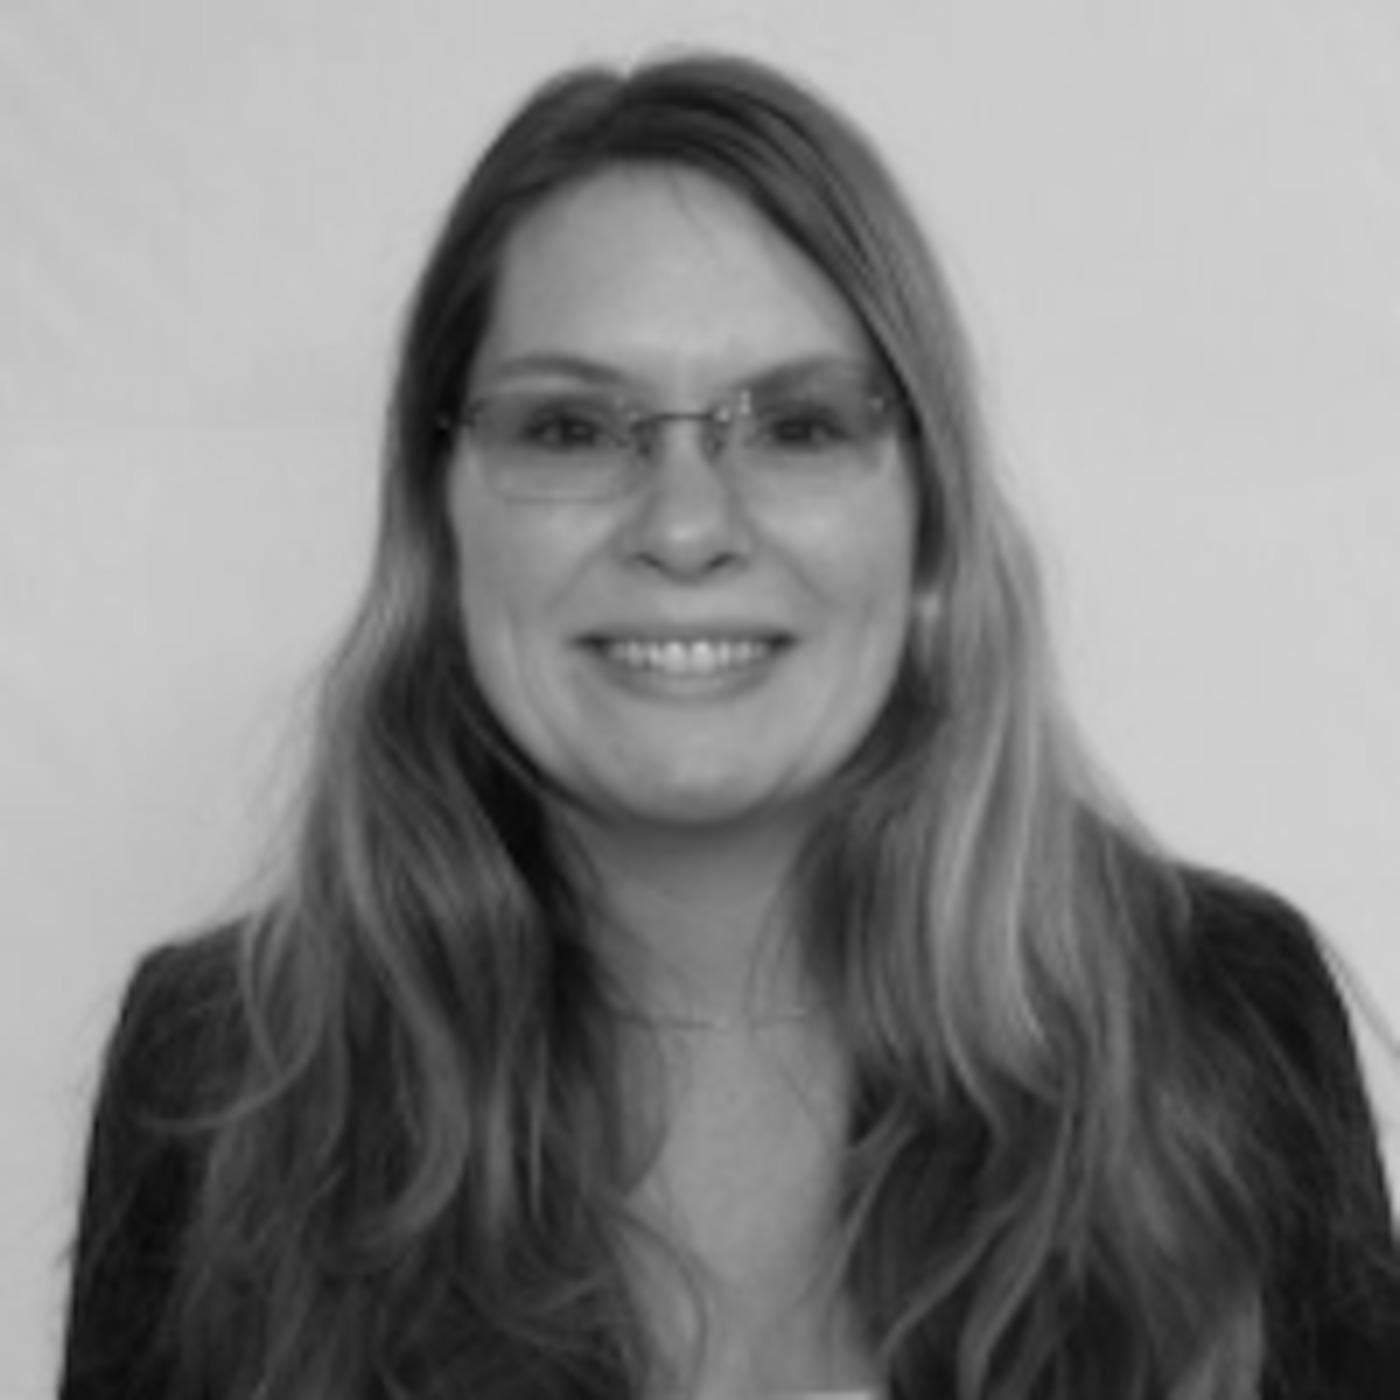 Irene Aasland: Modern Parenting Help